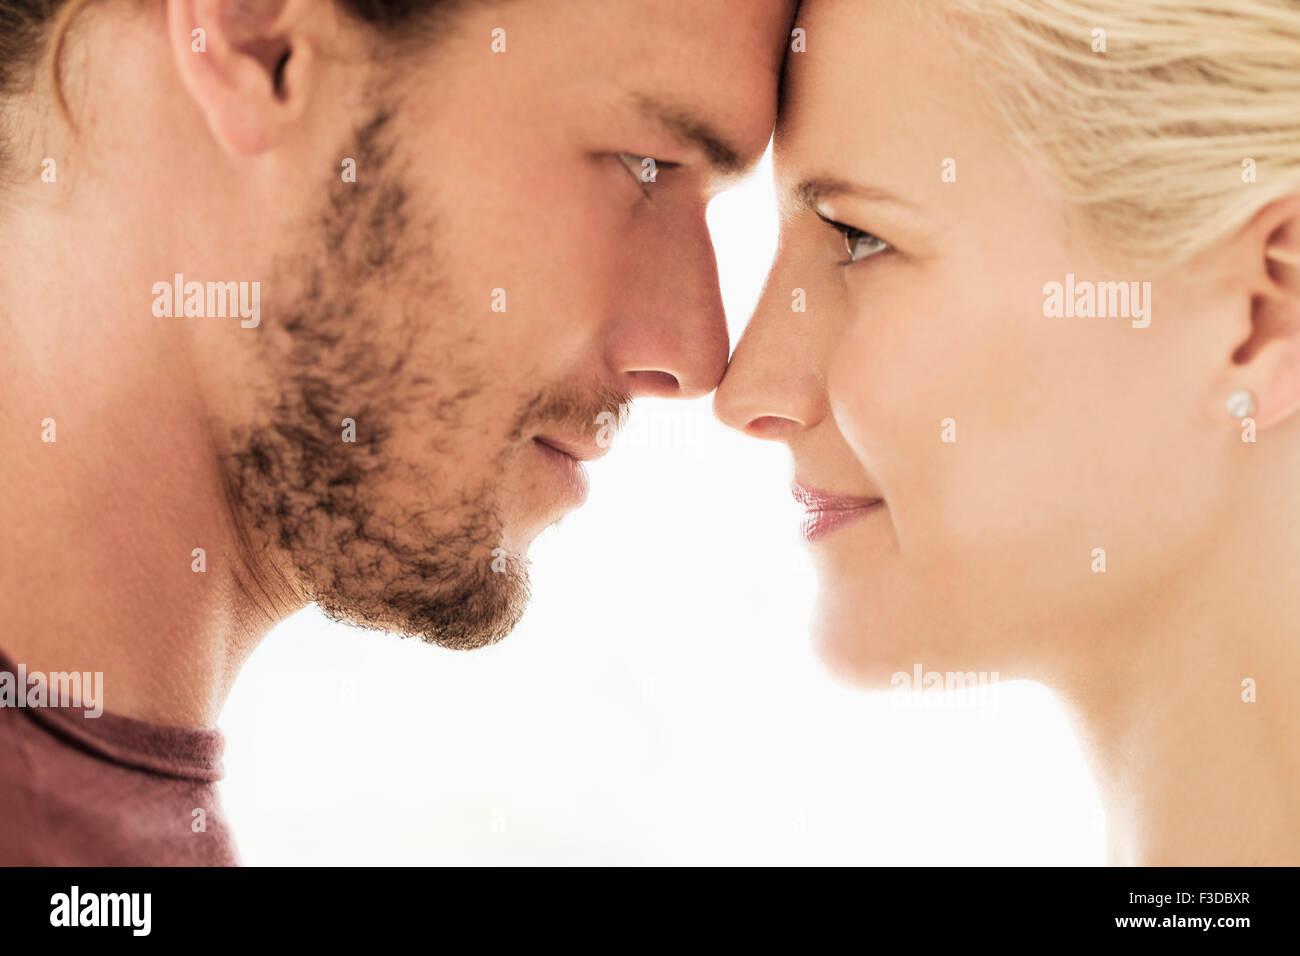 Couple rubbing noses on white background - Stock Image